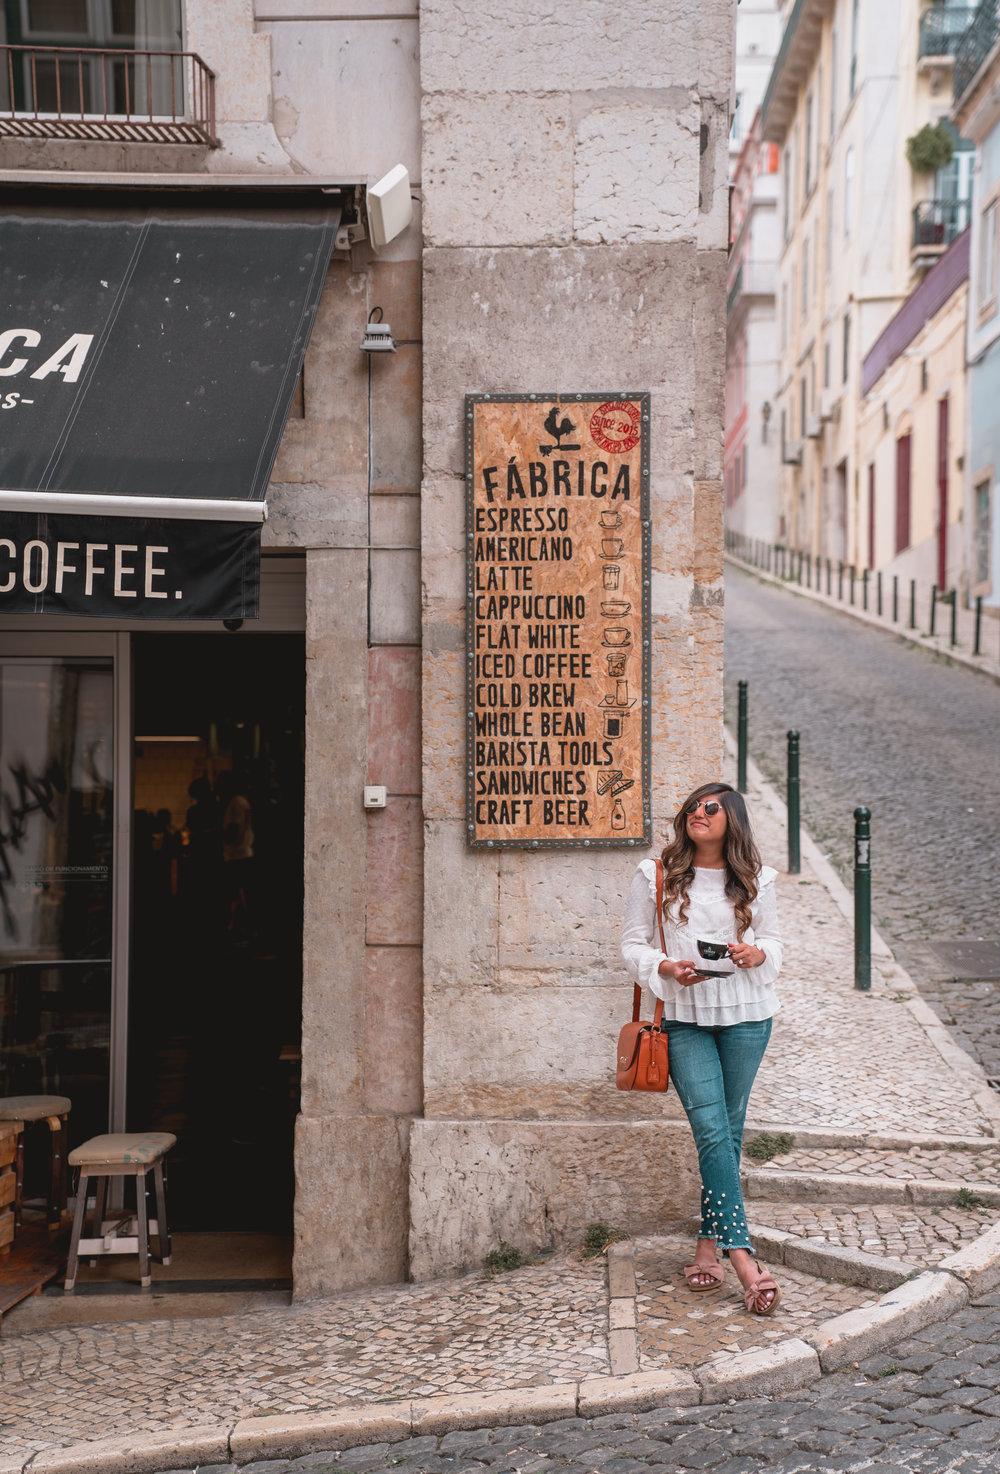 Coffee Break at Fabrica Coffee Roasters in Lisbon, Portugal